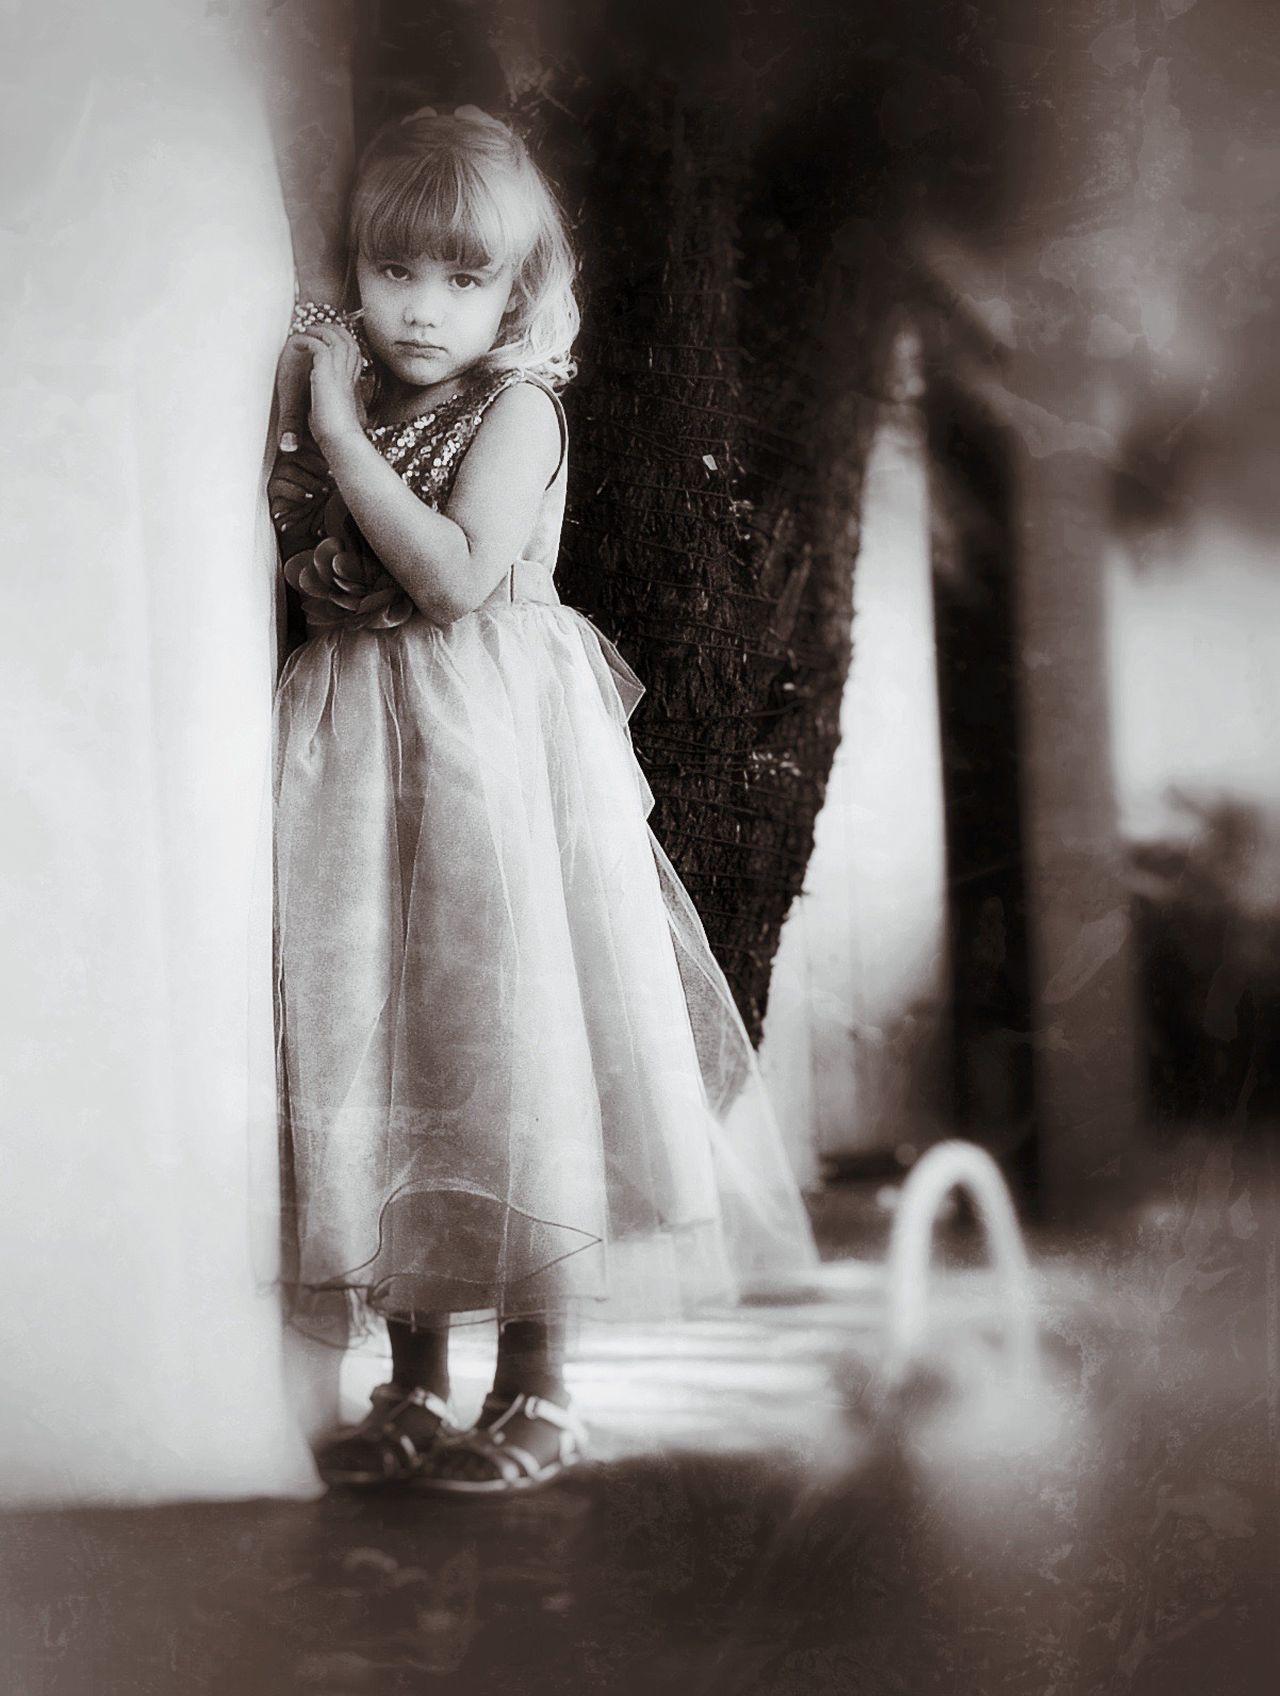 EyeEm Porto Weddingphotographer Wedding Flower Girls Innocence Monochrome Black And White Photography Bnw Children Childhood